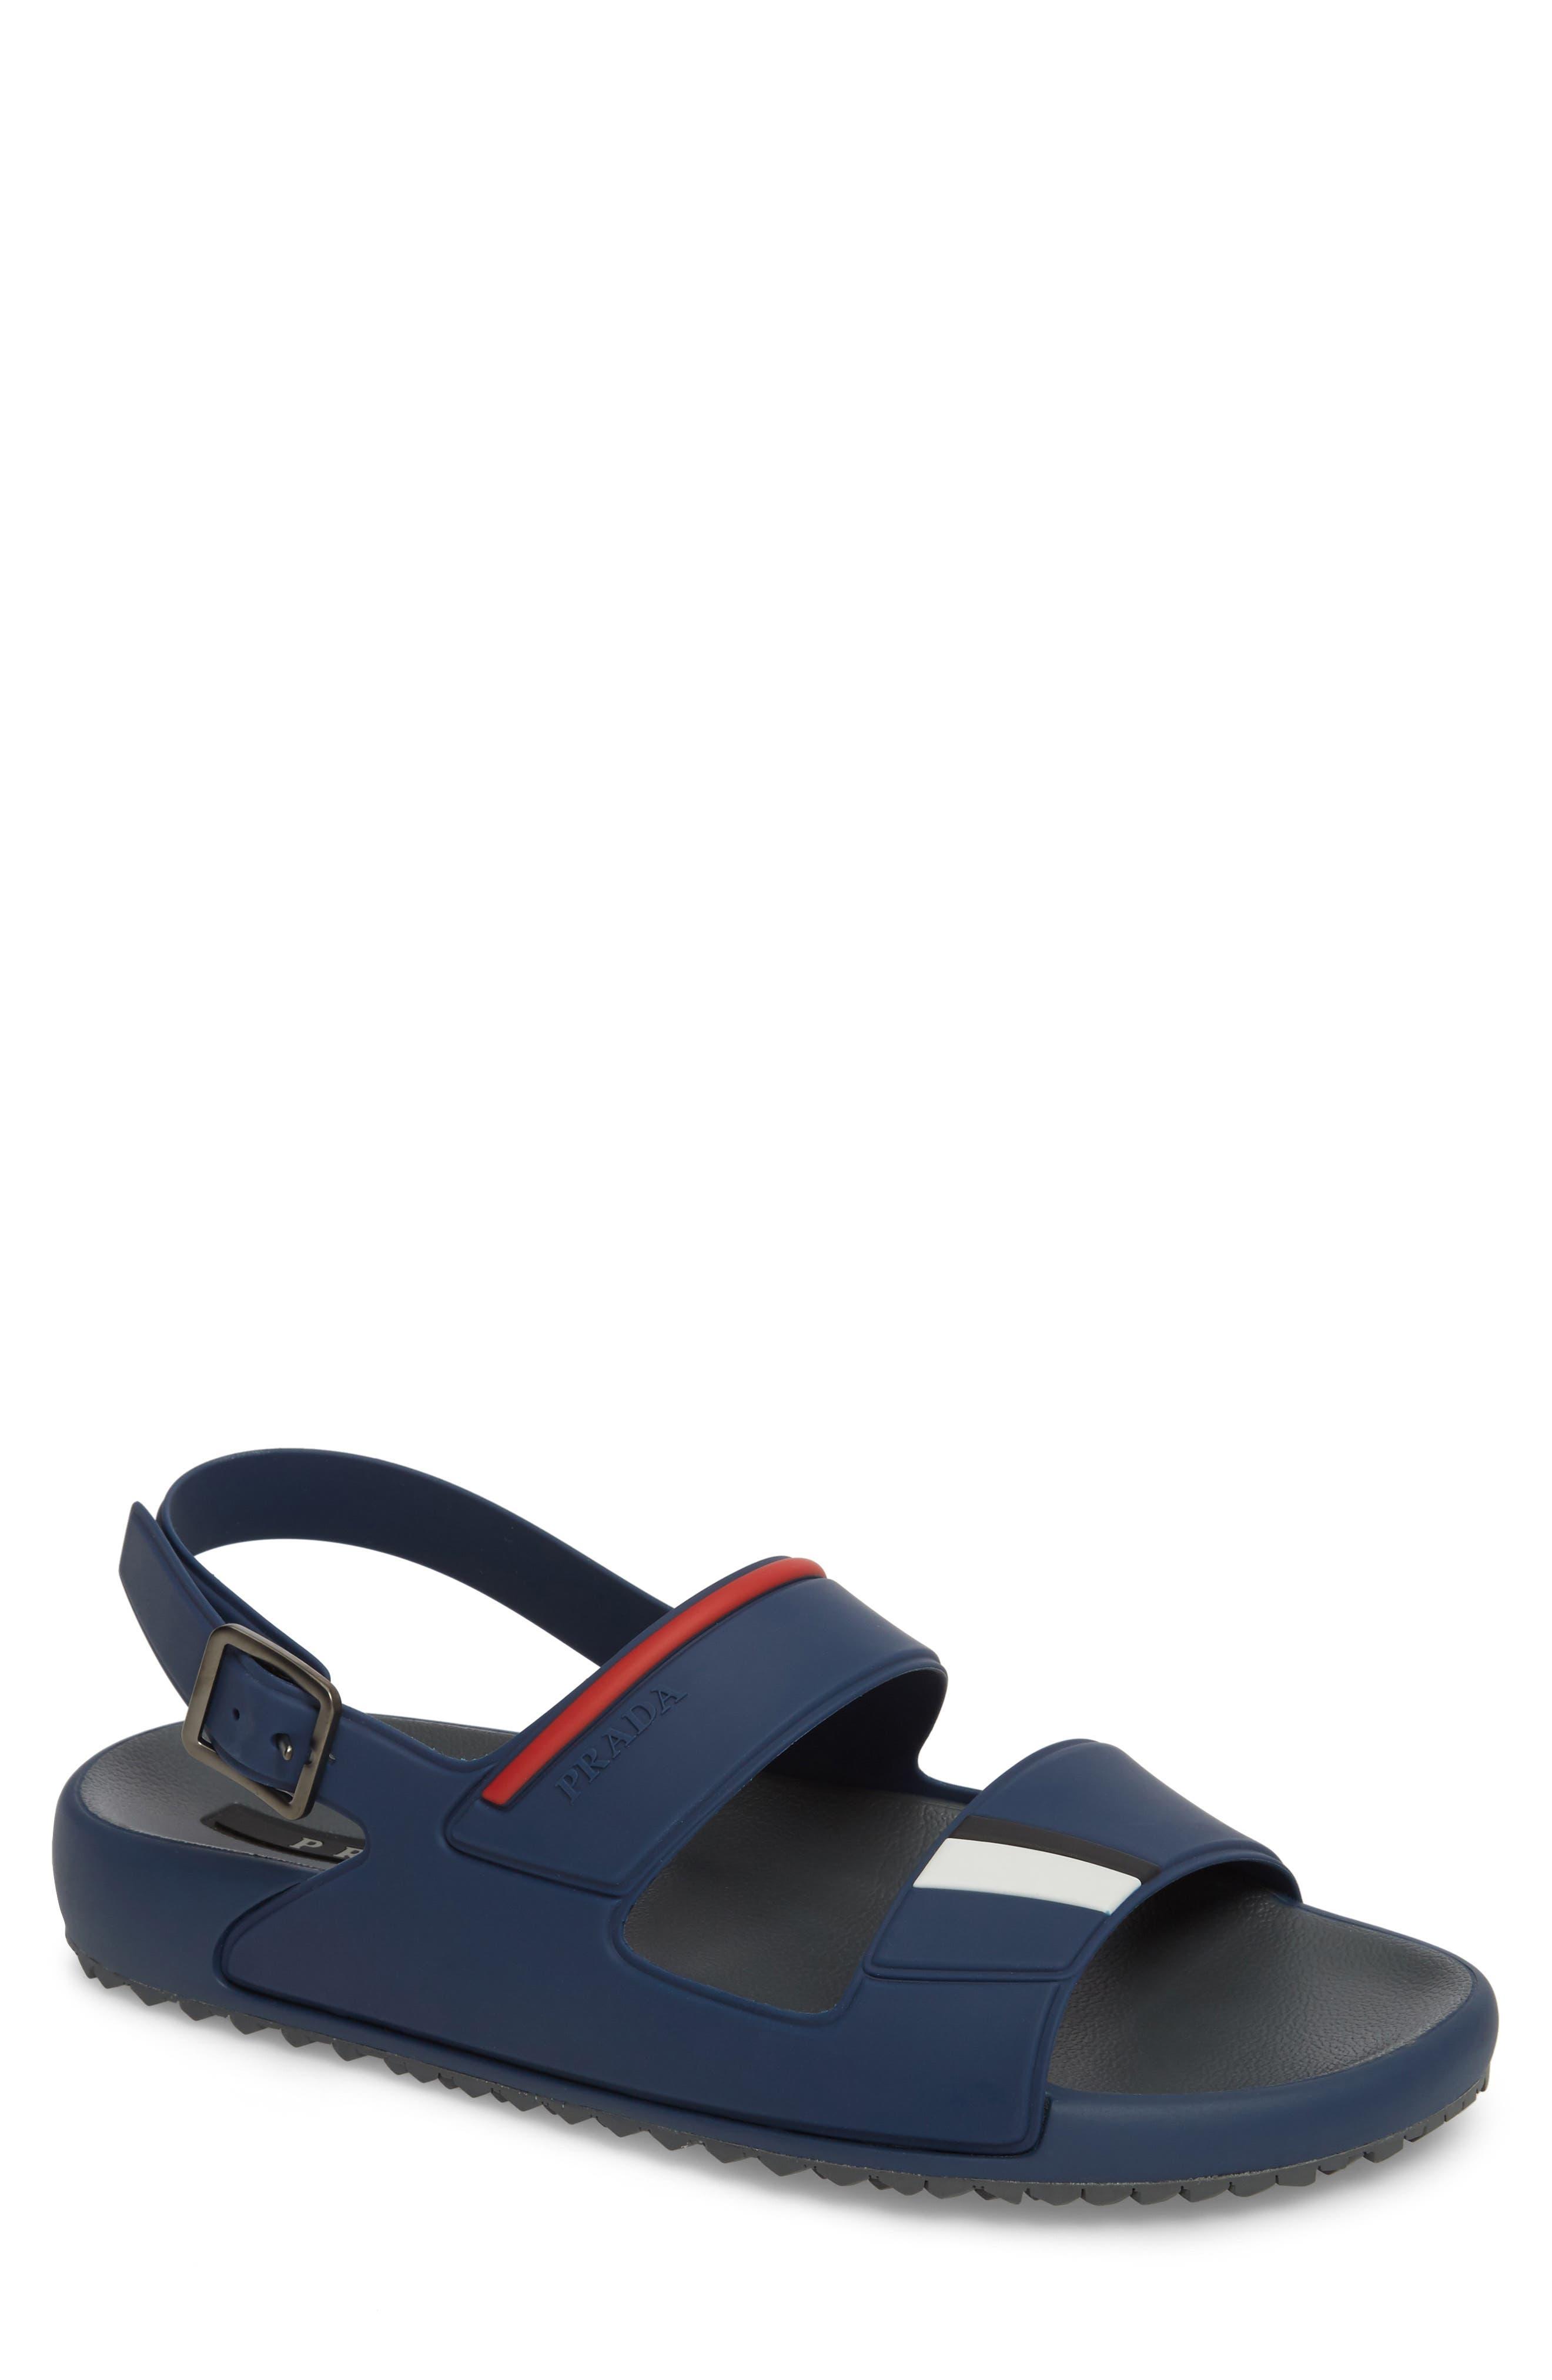 Alternate Image 1 Selected - Prada Linea Rossa Sandal (Men)